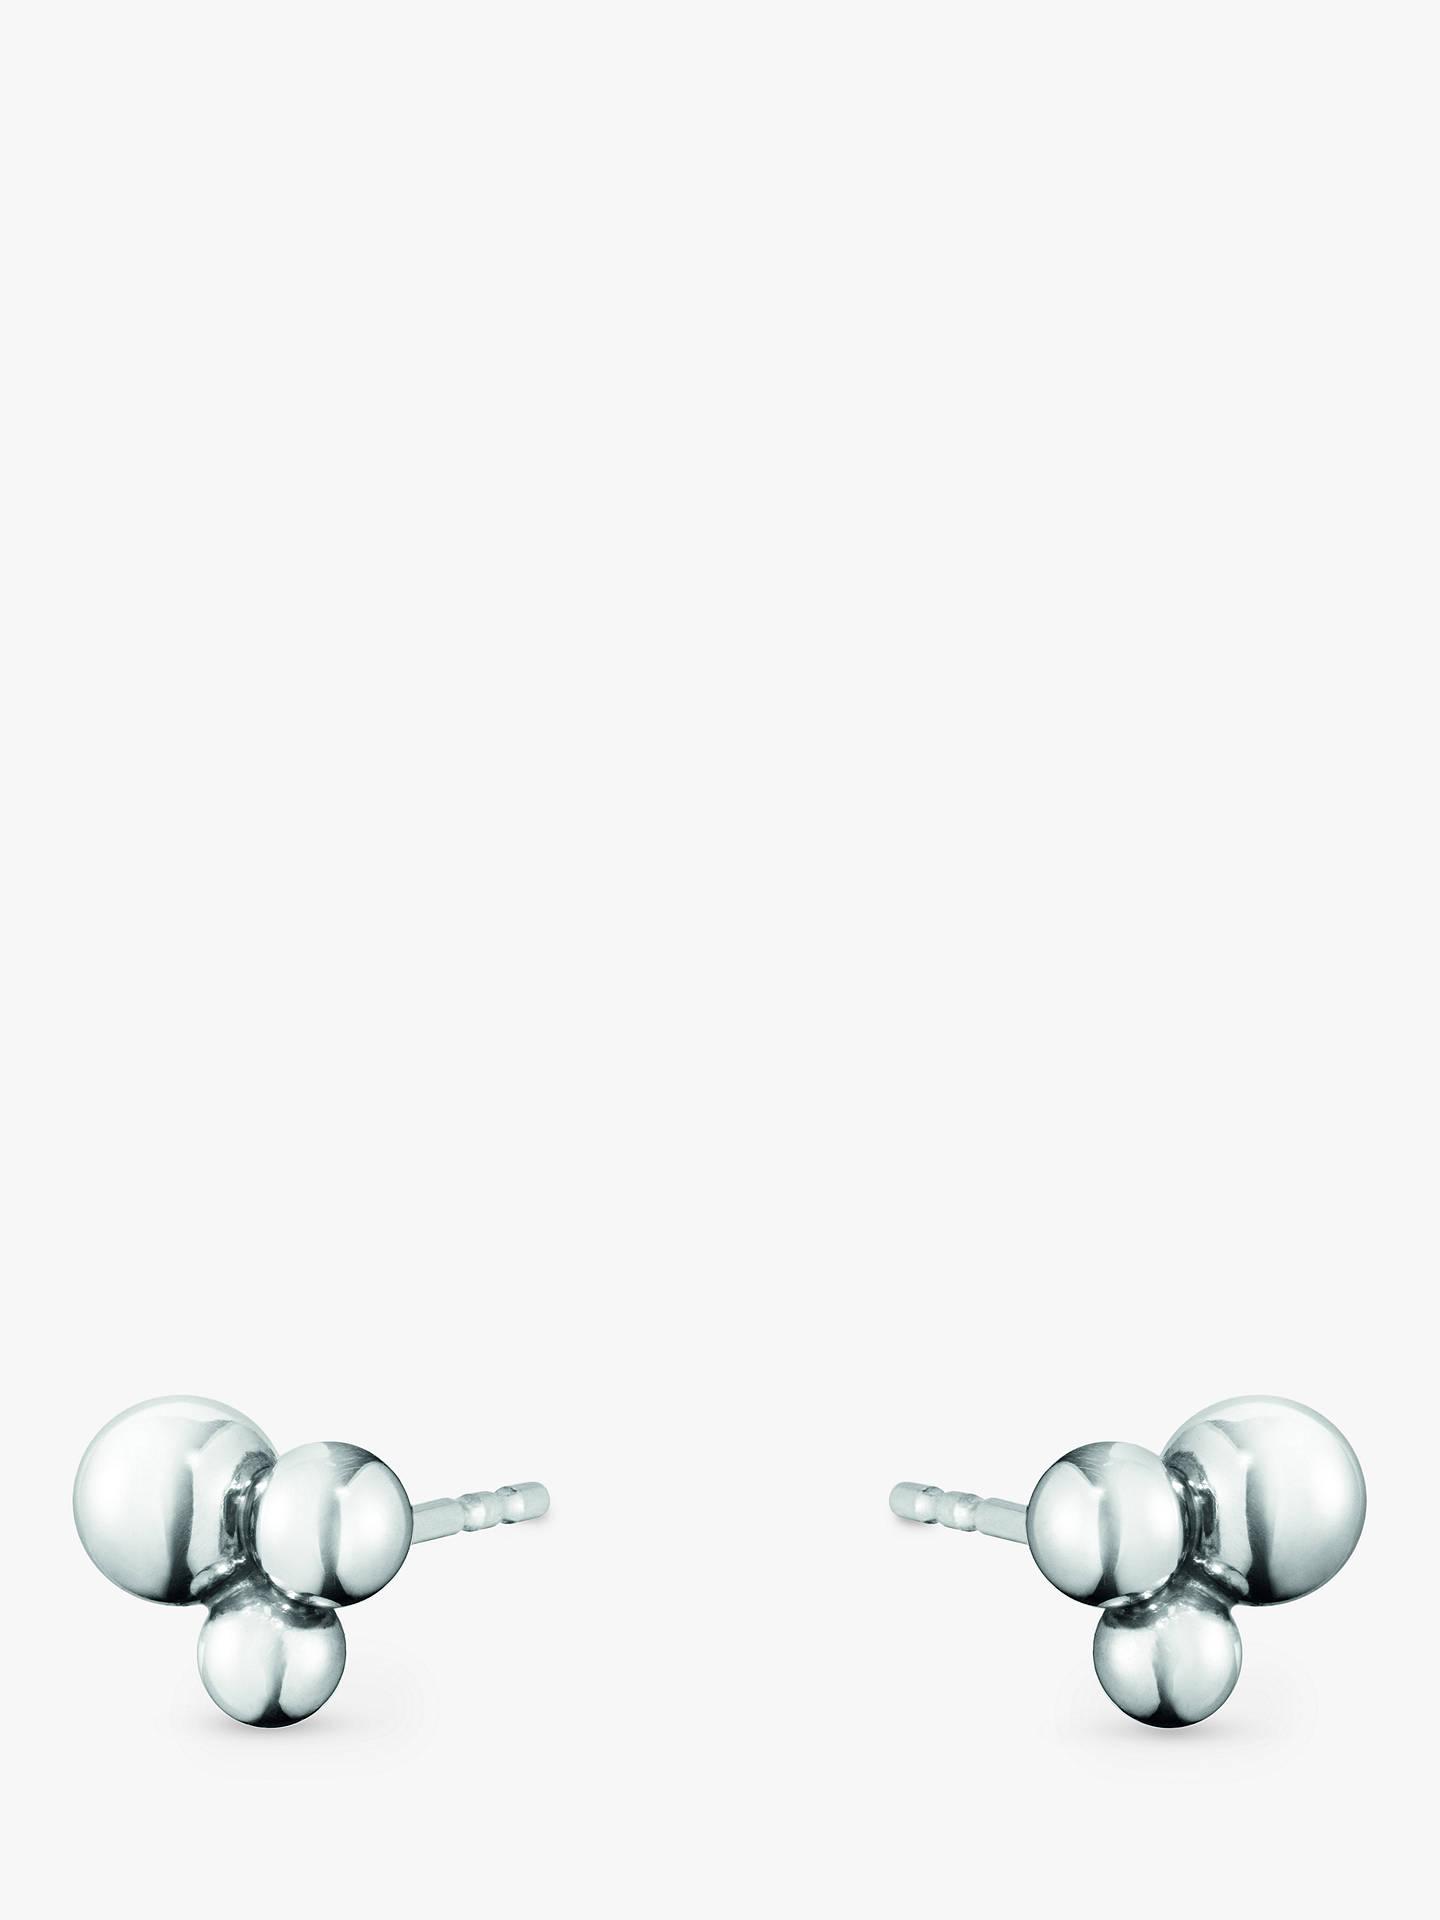 945e8a40d Buy Georg Jensen Sterling Silver Moonlight Grapes Stud Earrings, Silver  Online at johnlewis.com